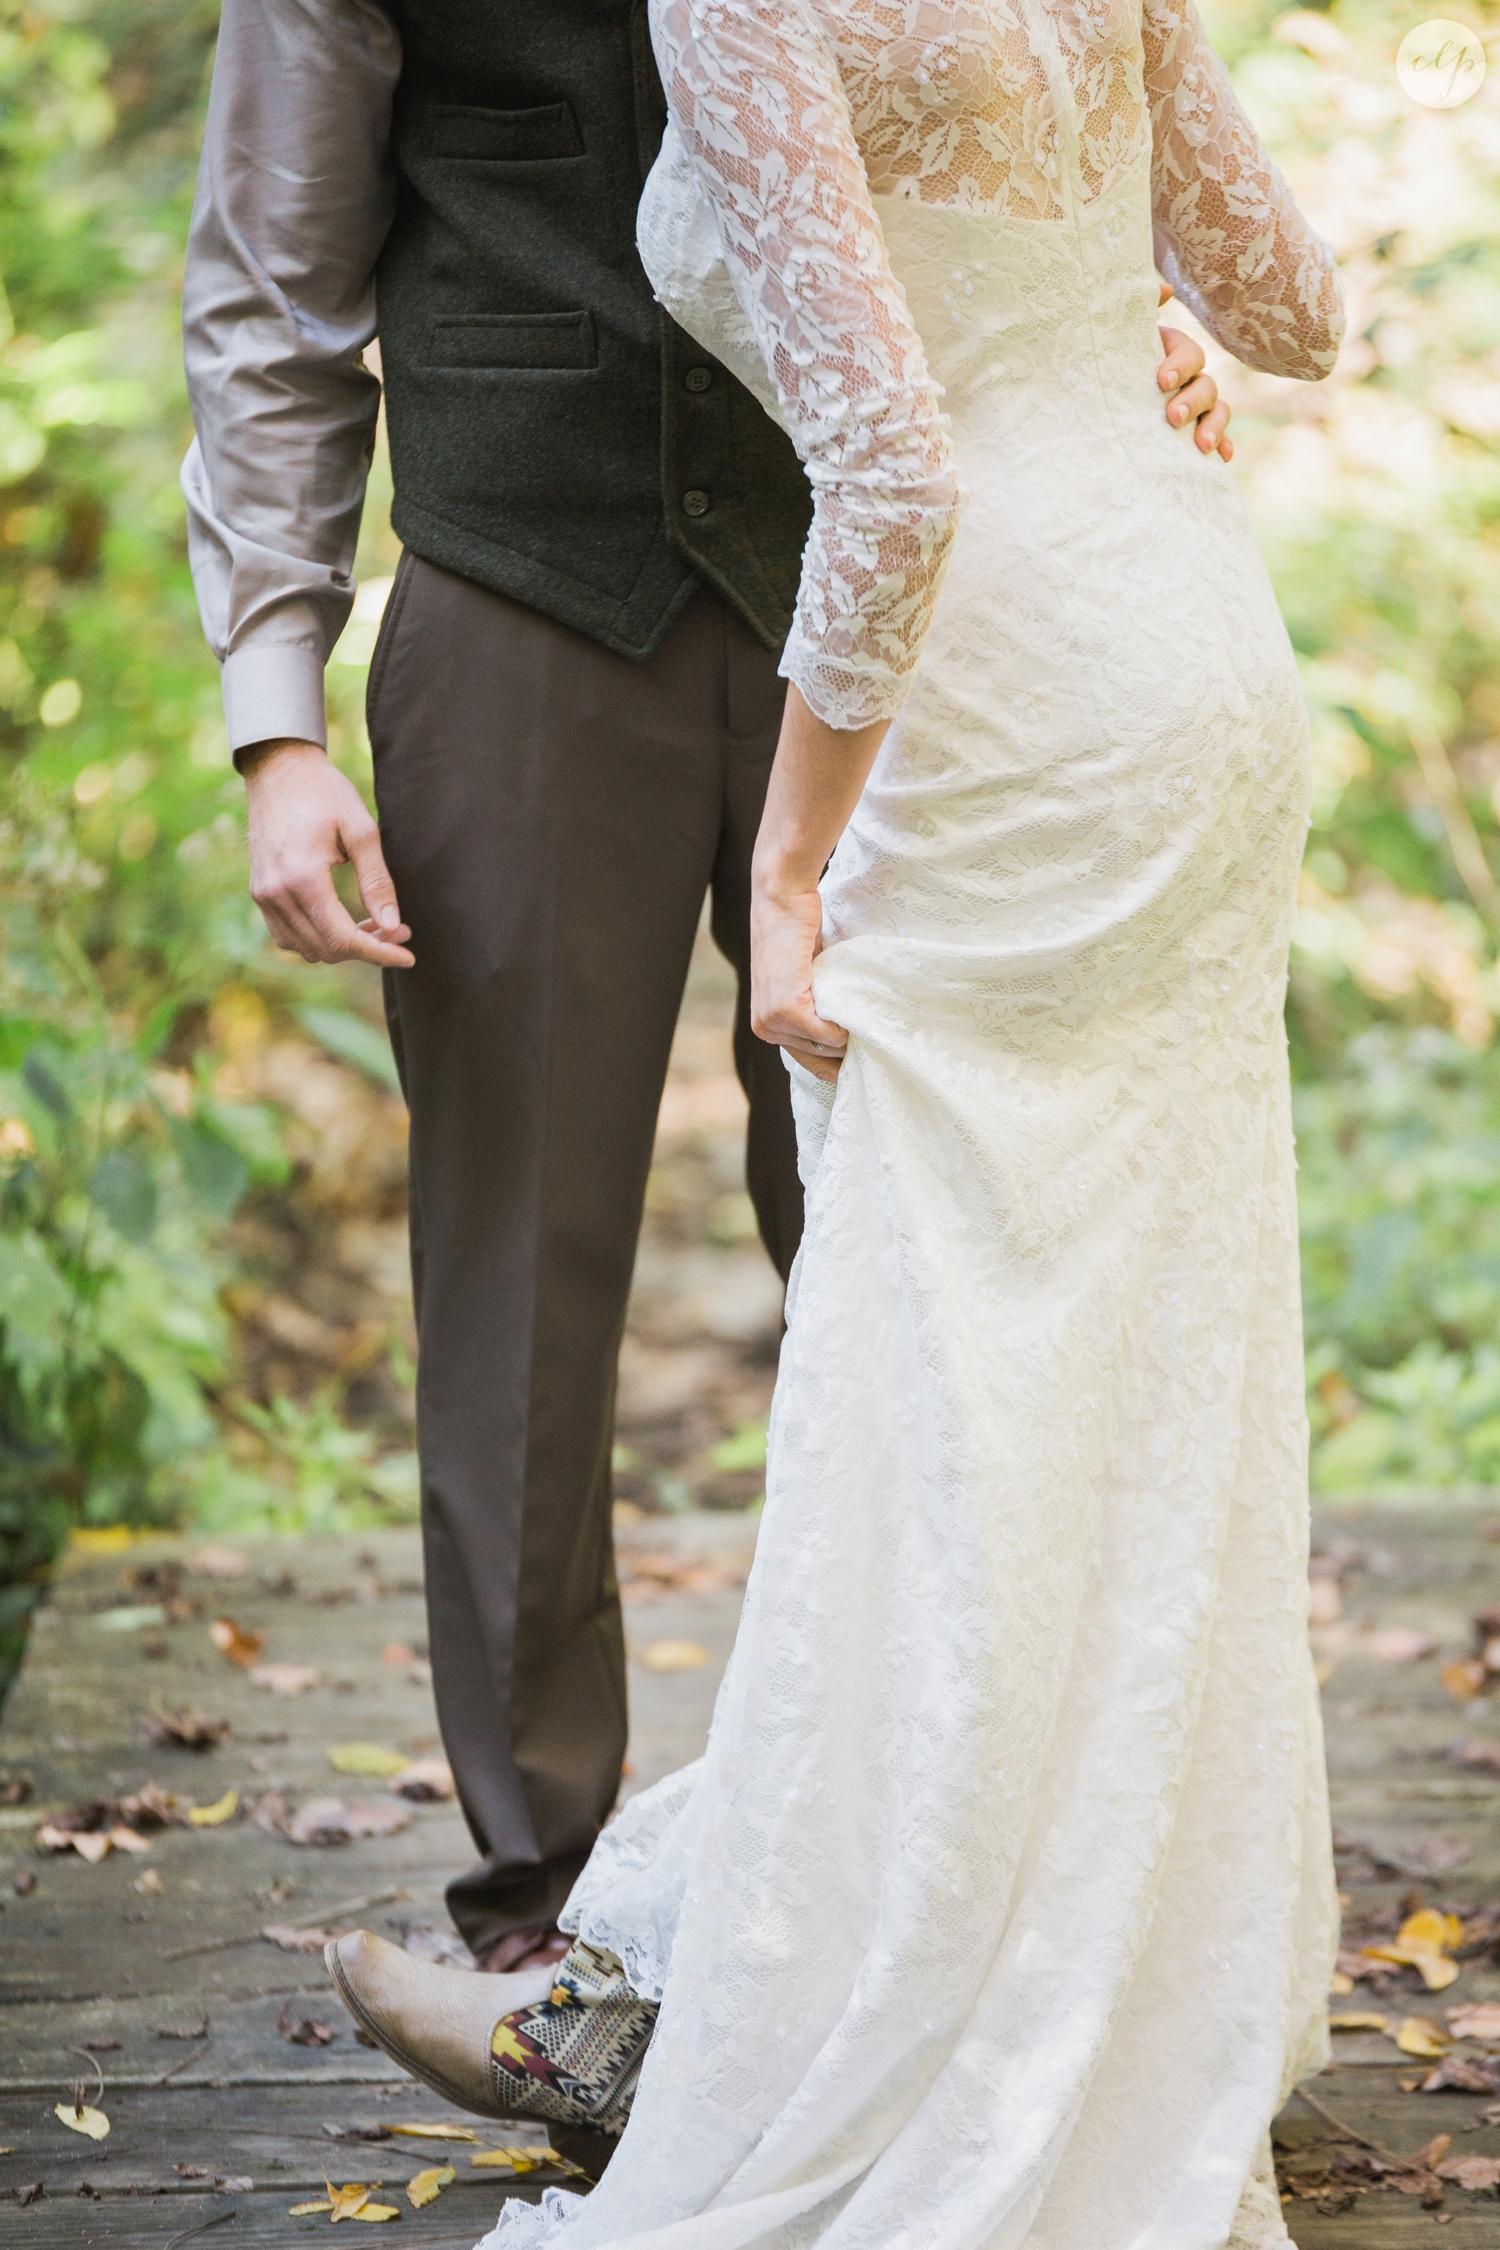 Outdoor-Wedding-in-the-Woods-Photography_4206.jpg